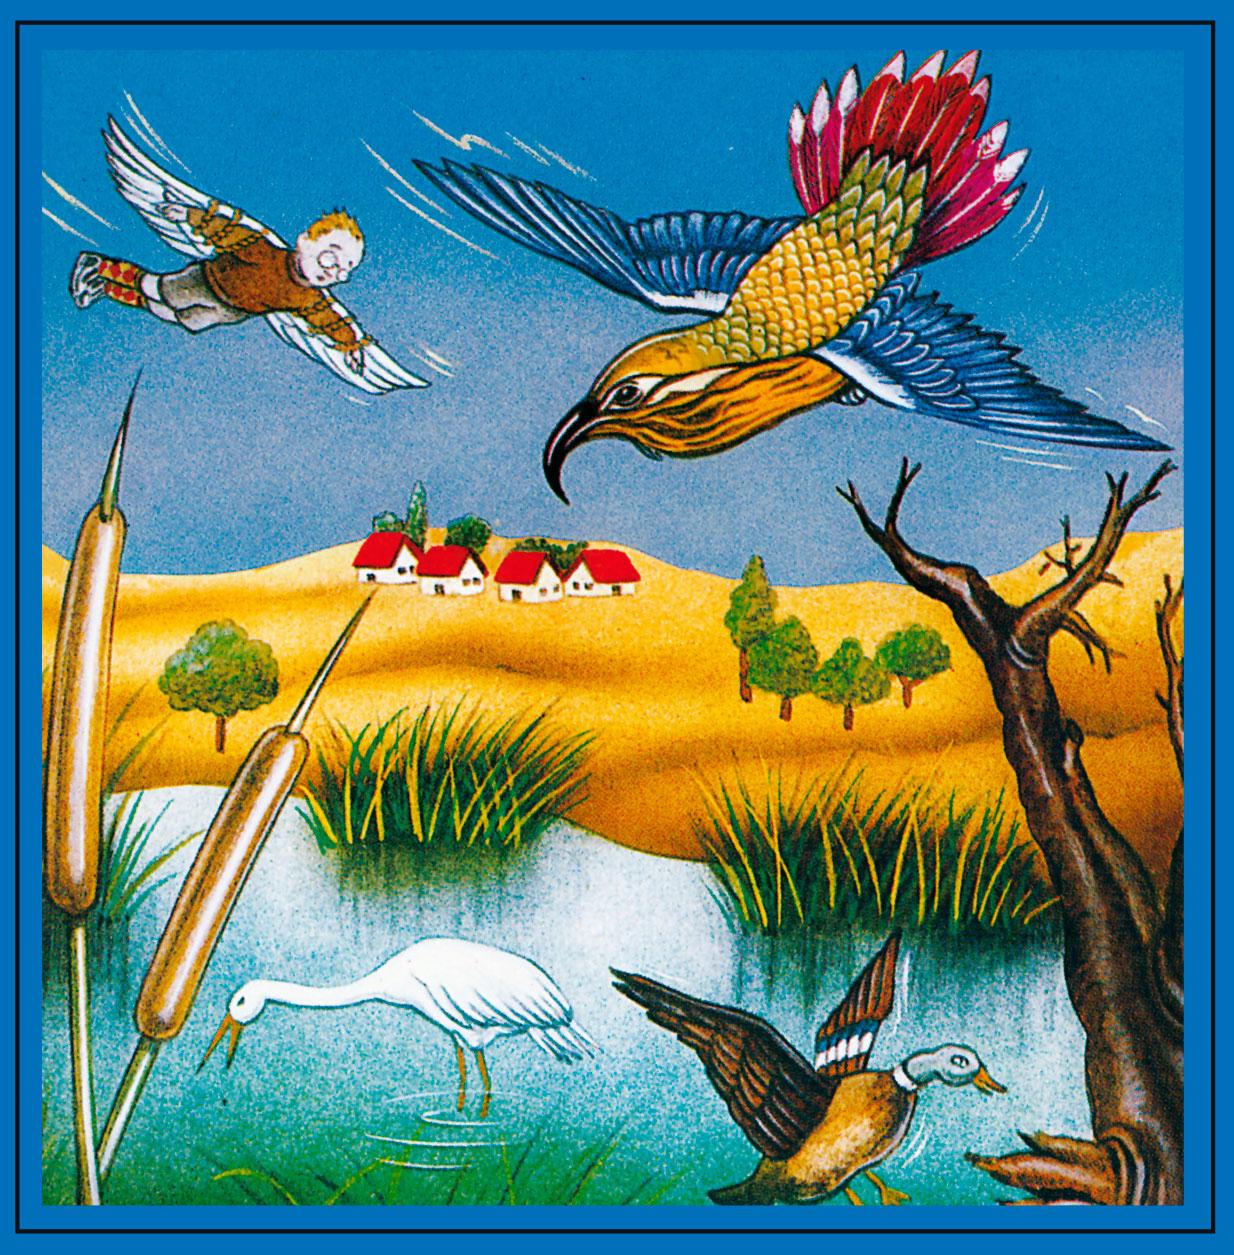 Roald Dahl Historias extraordinarias